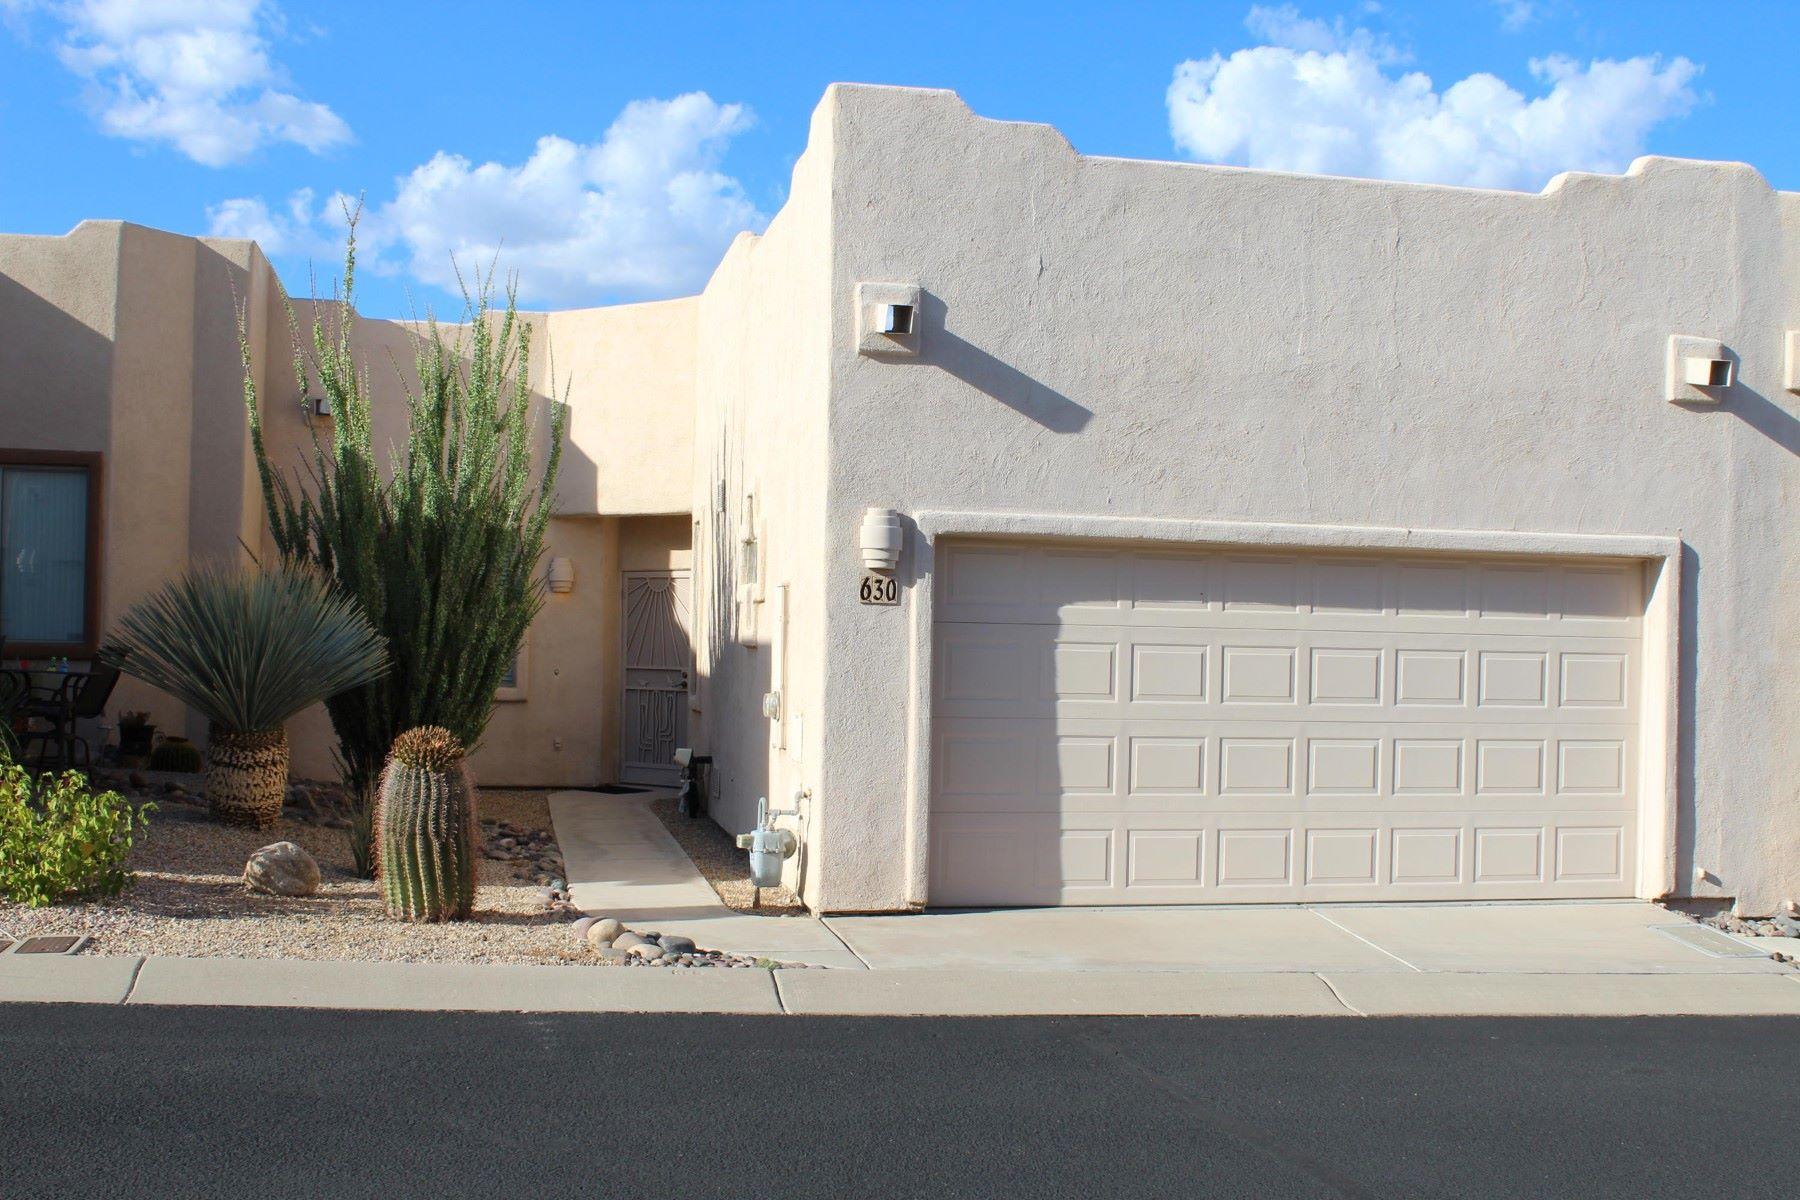 Таунхаус для того Продажа на Impeccably Maintained Townhome 630 W Woodfield Court, Green Valley, Аризона, 85614 Соединенные Штаты